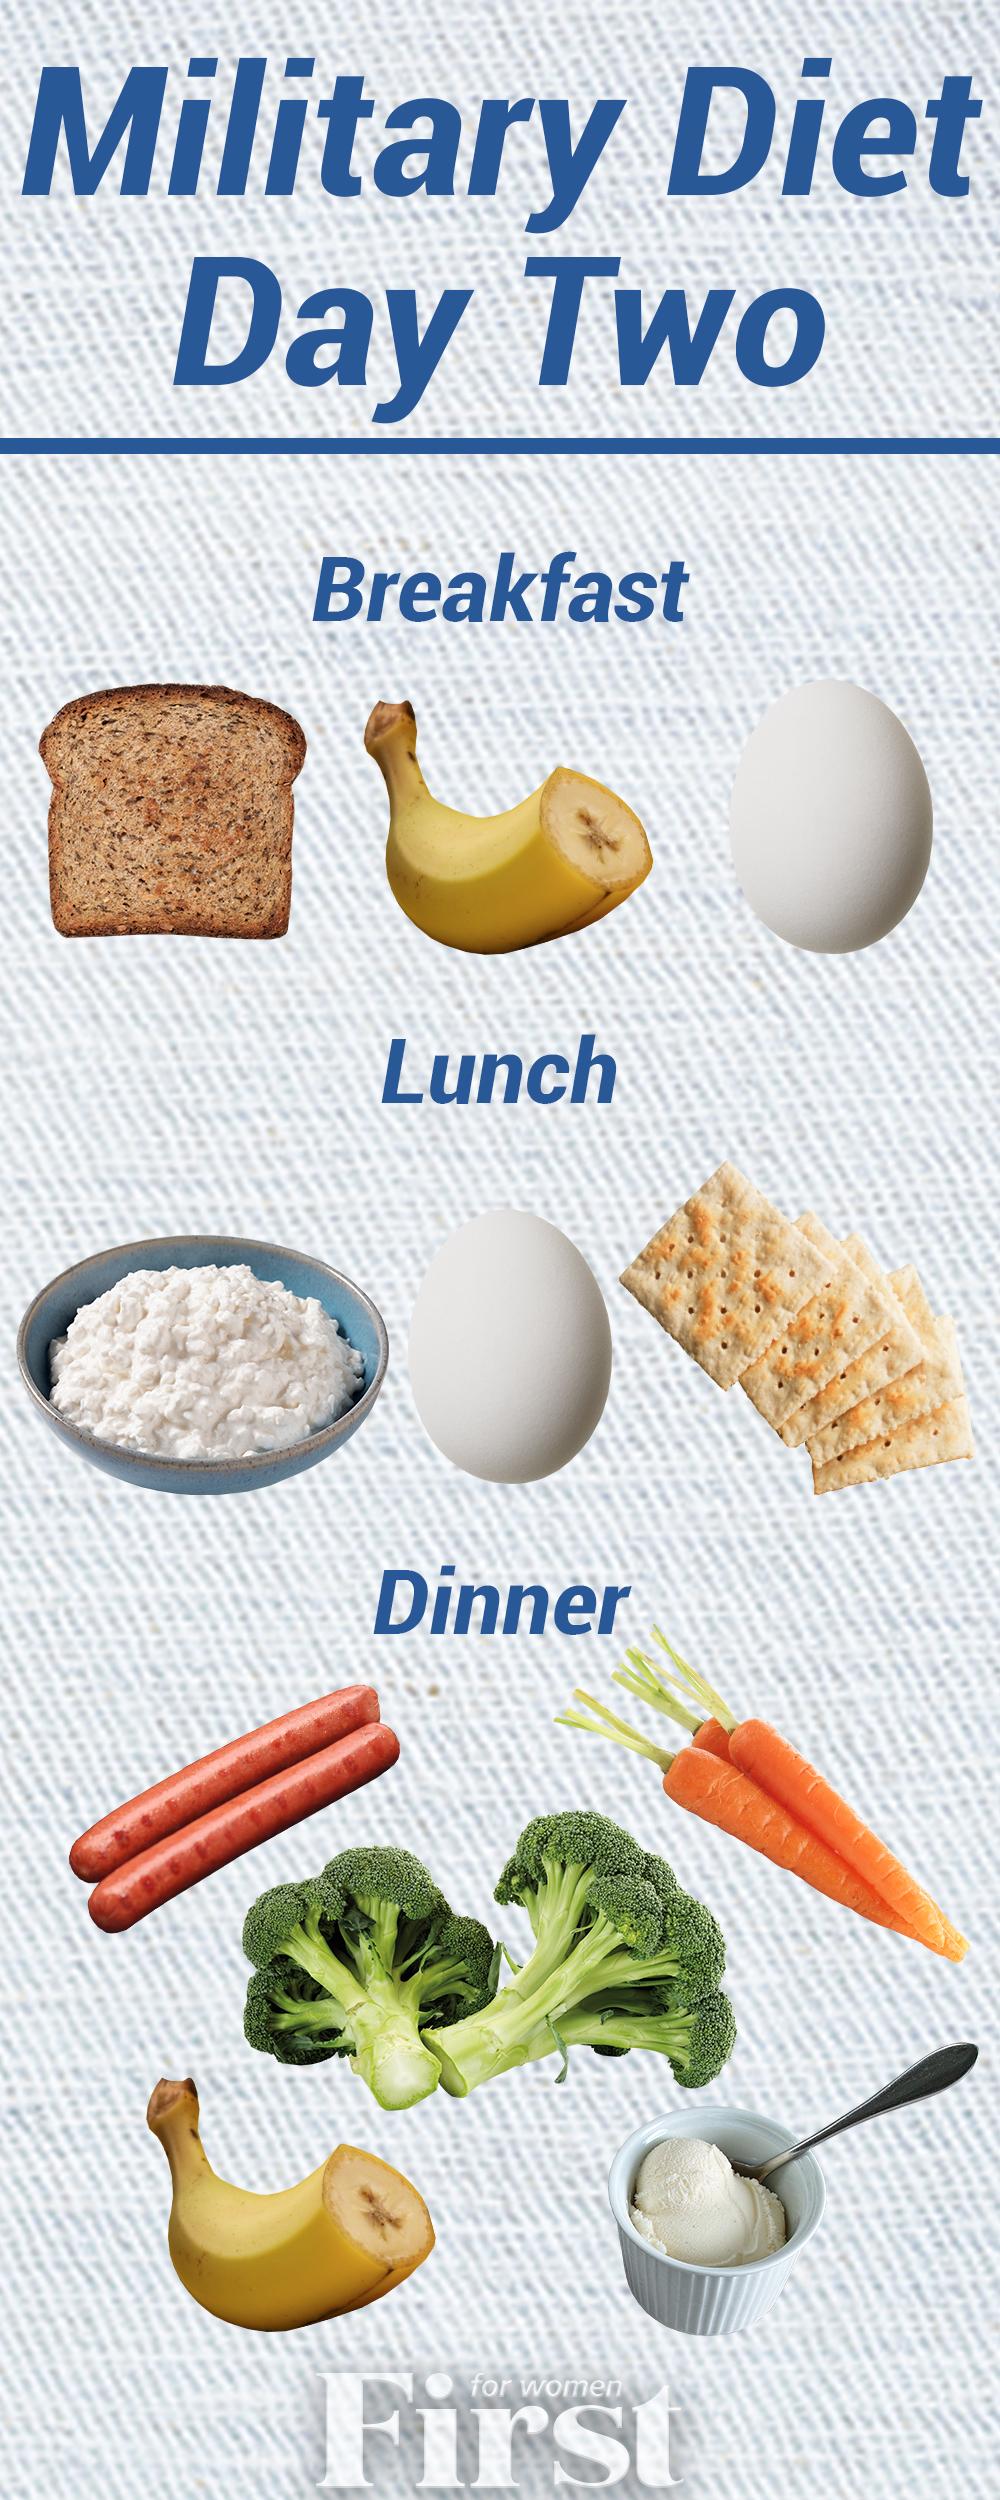 Military Diet Menu